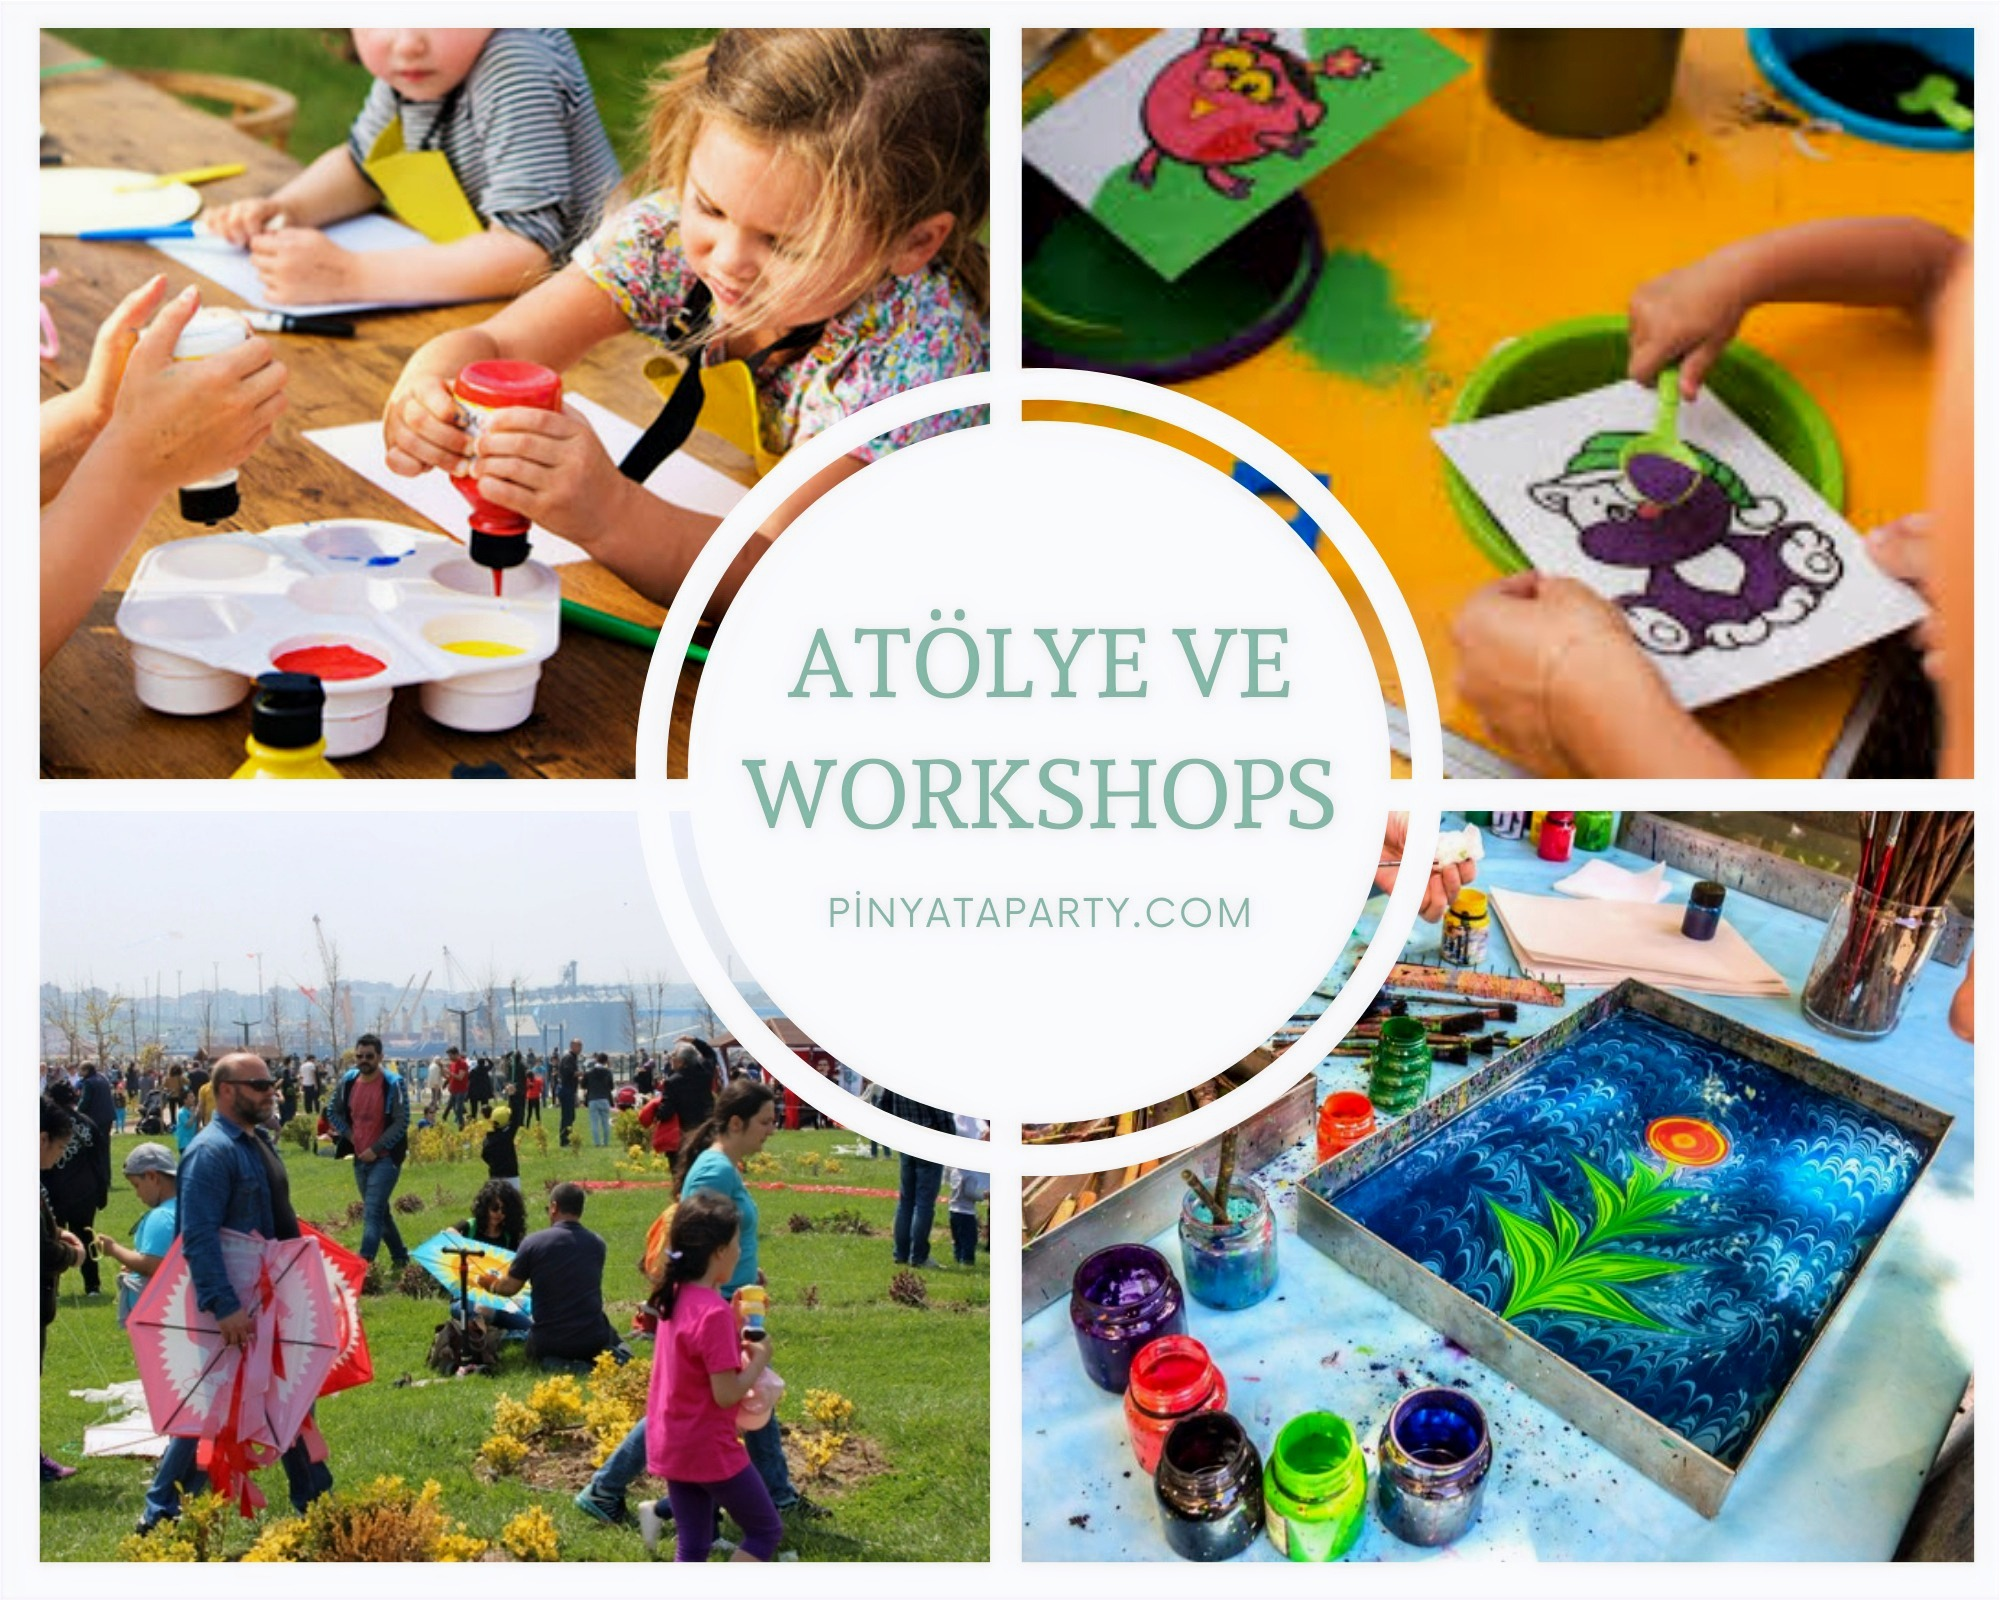 Piknik-Atolye-ve-workshops_edited